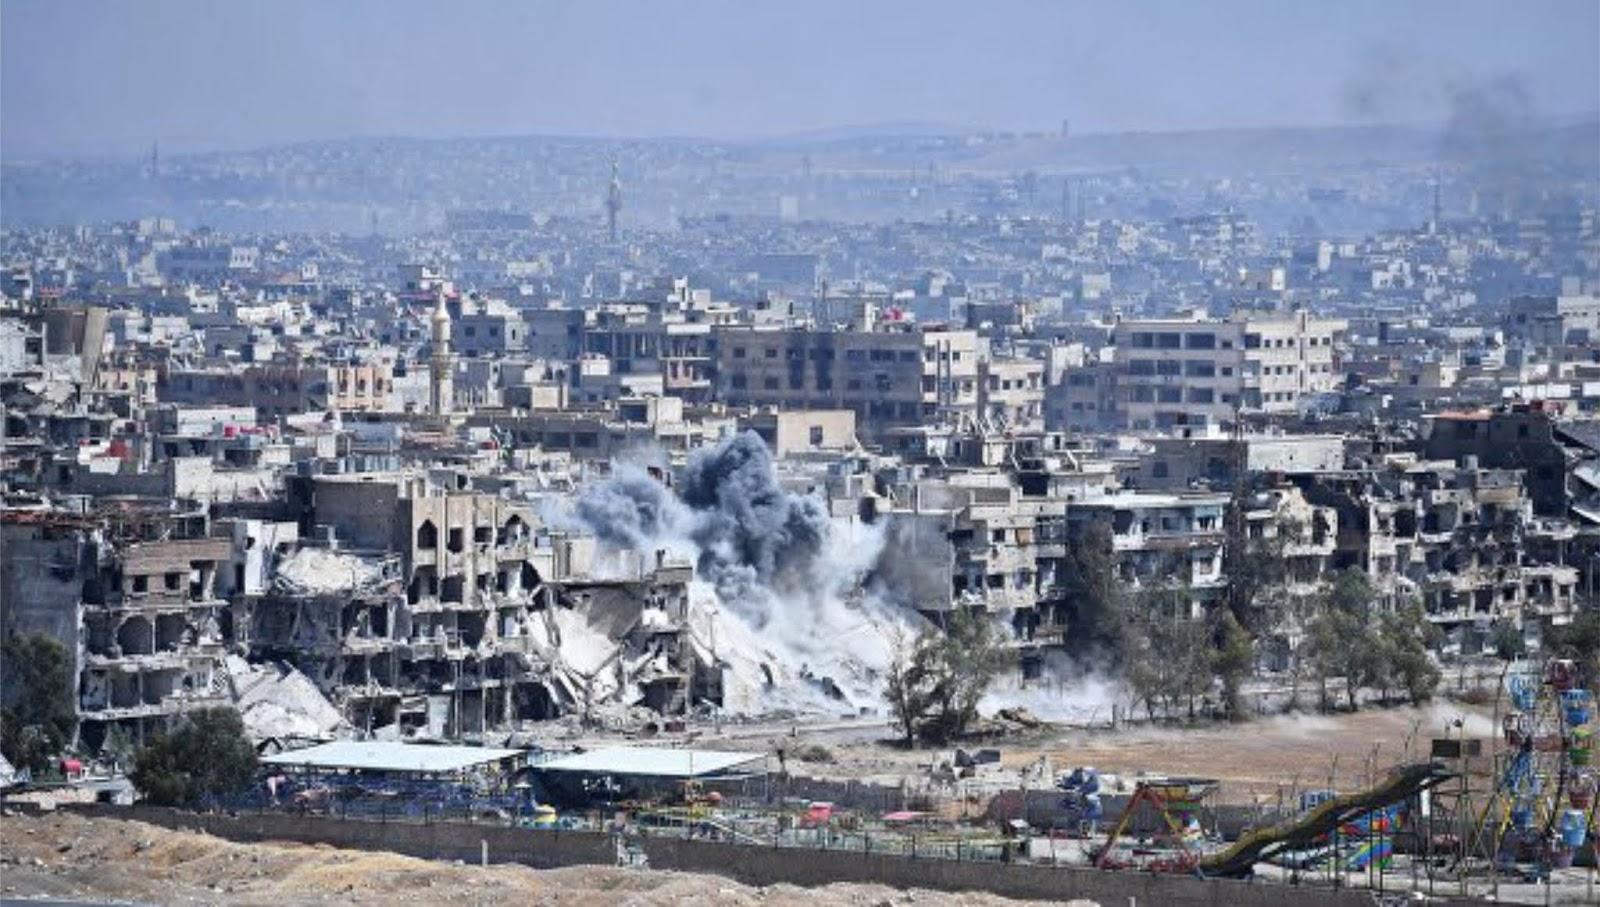 Amerika punya cara sendiri membasmi teroris di Suriah